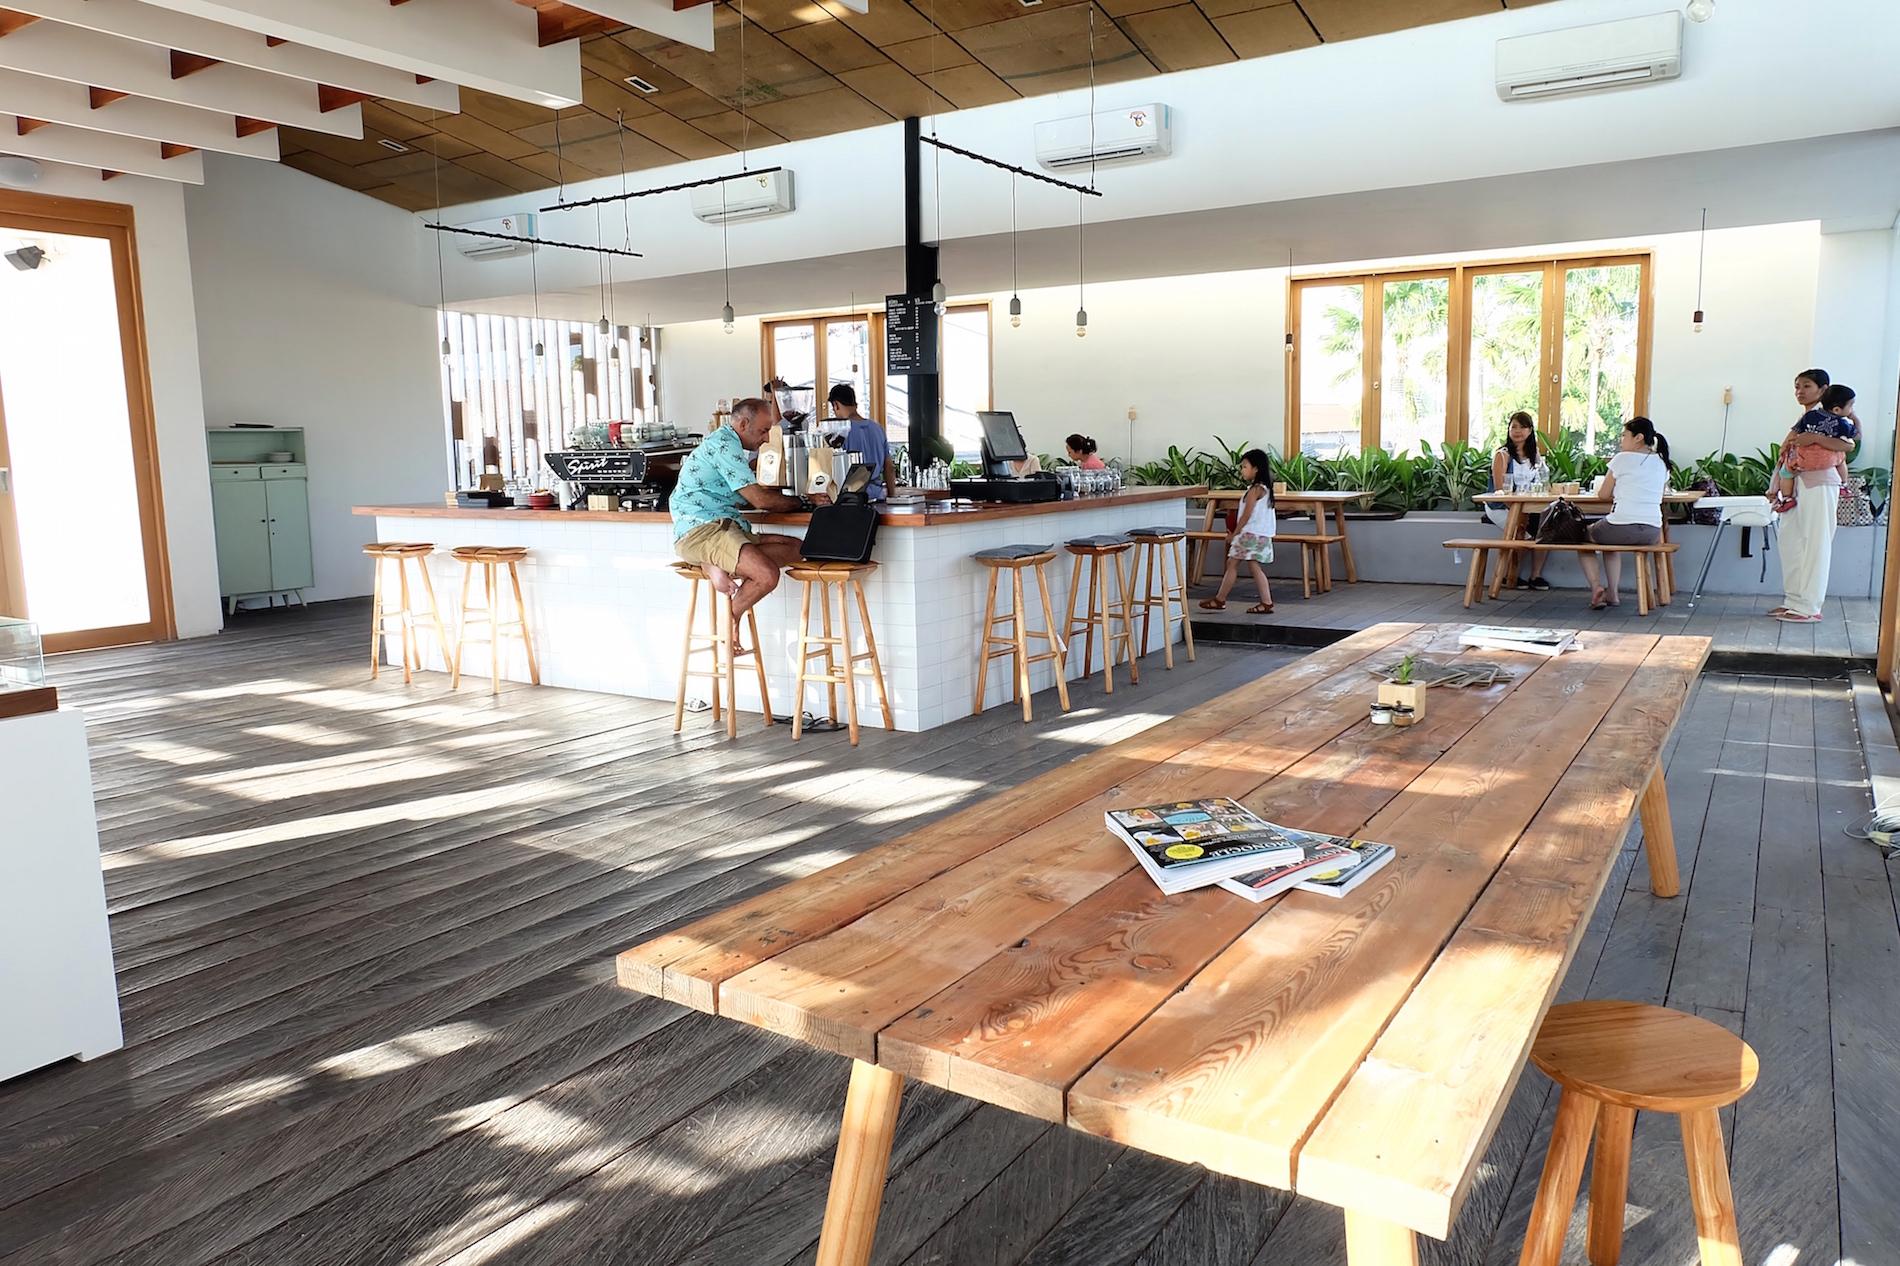 Livingstone Cafe Bakery Popular Establishment In Seminyak Bali